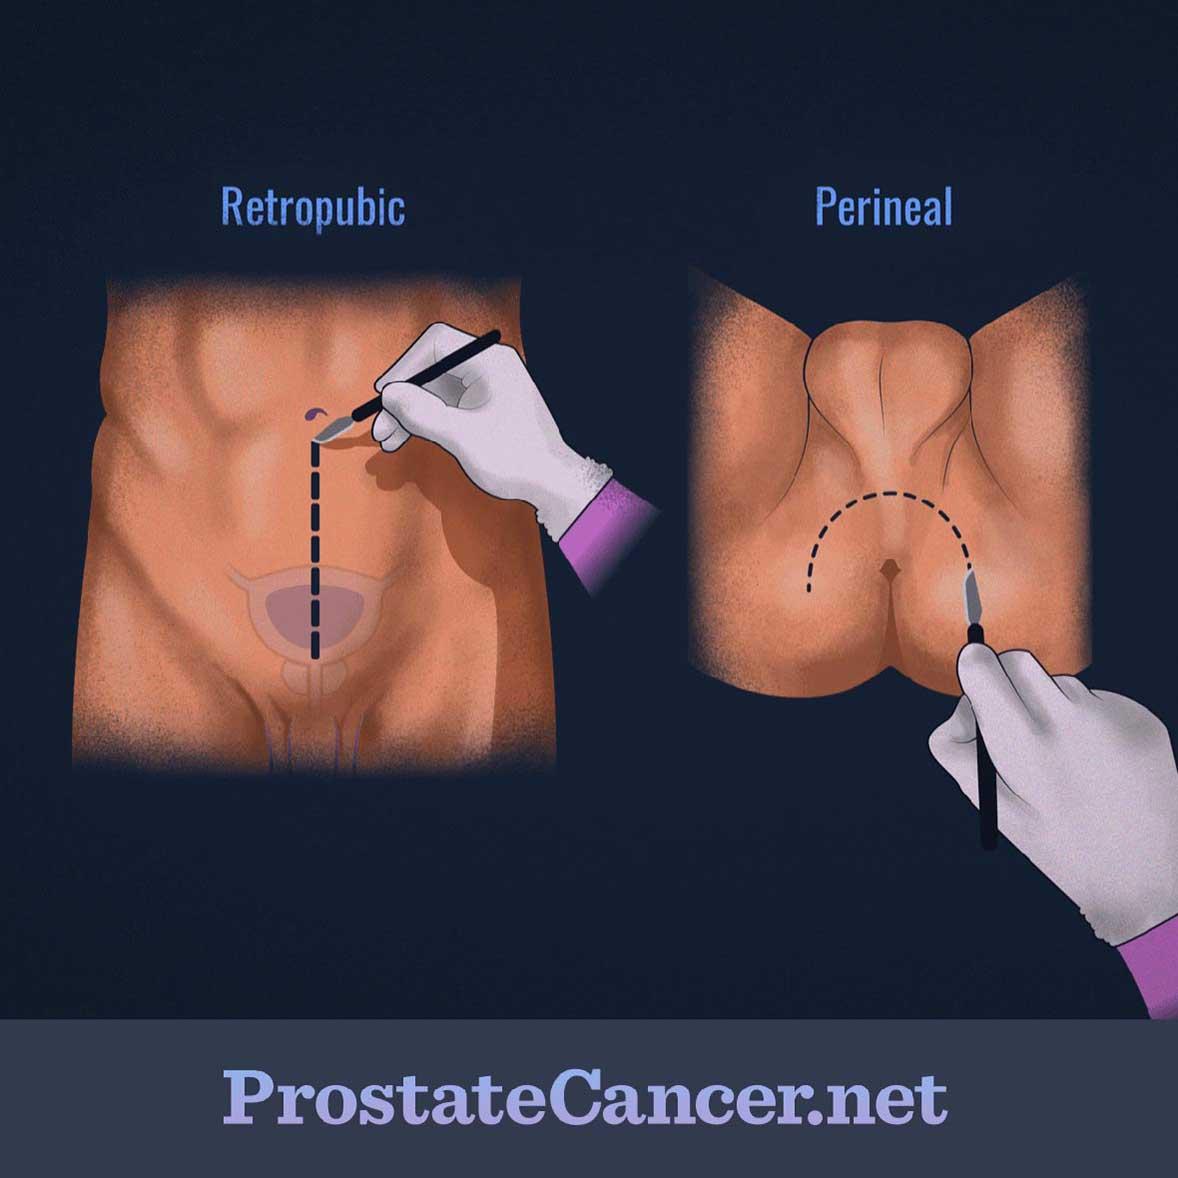 What Is Radical Prostatectomy Prostatecancer Net